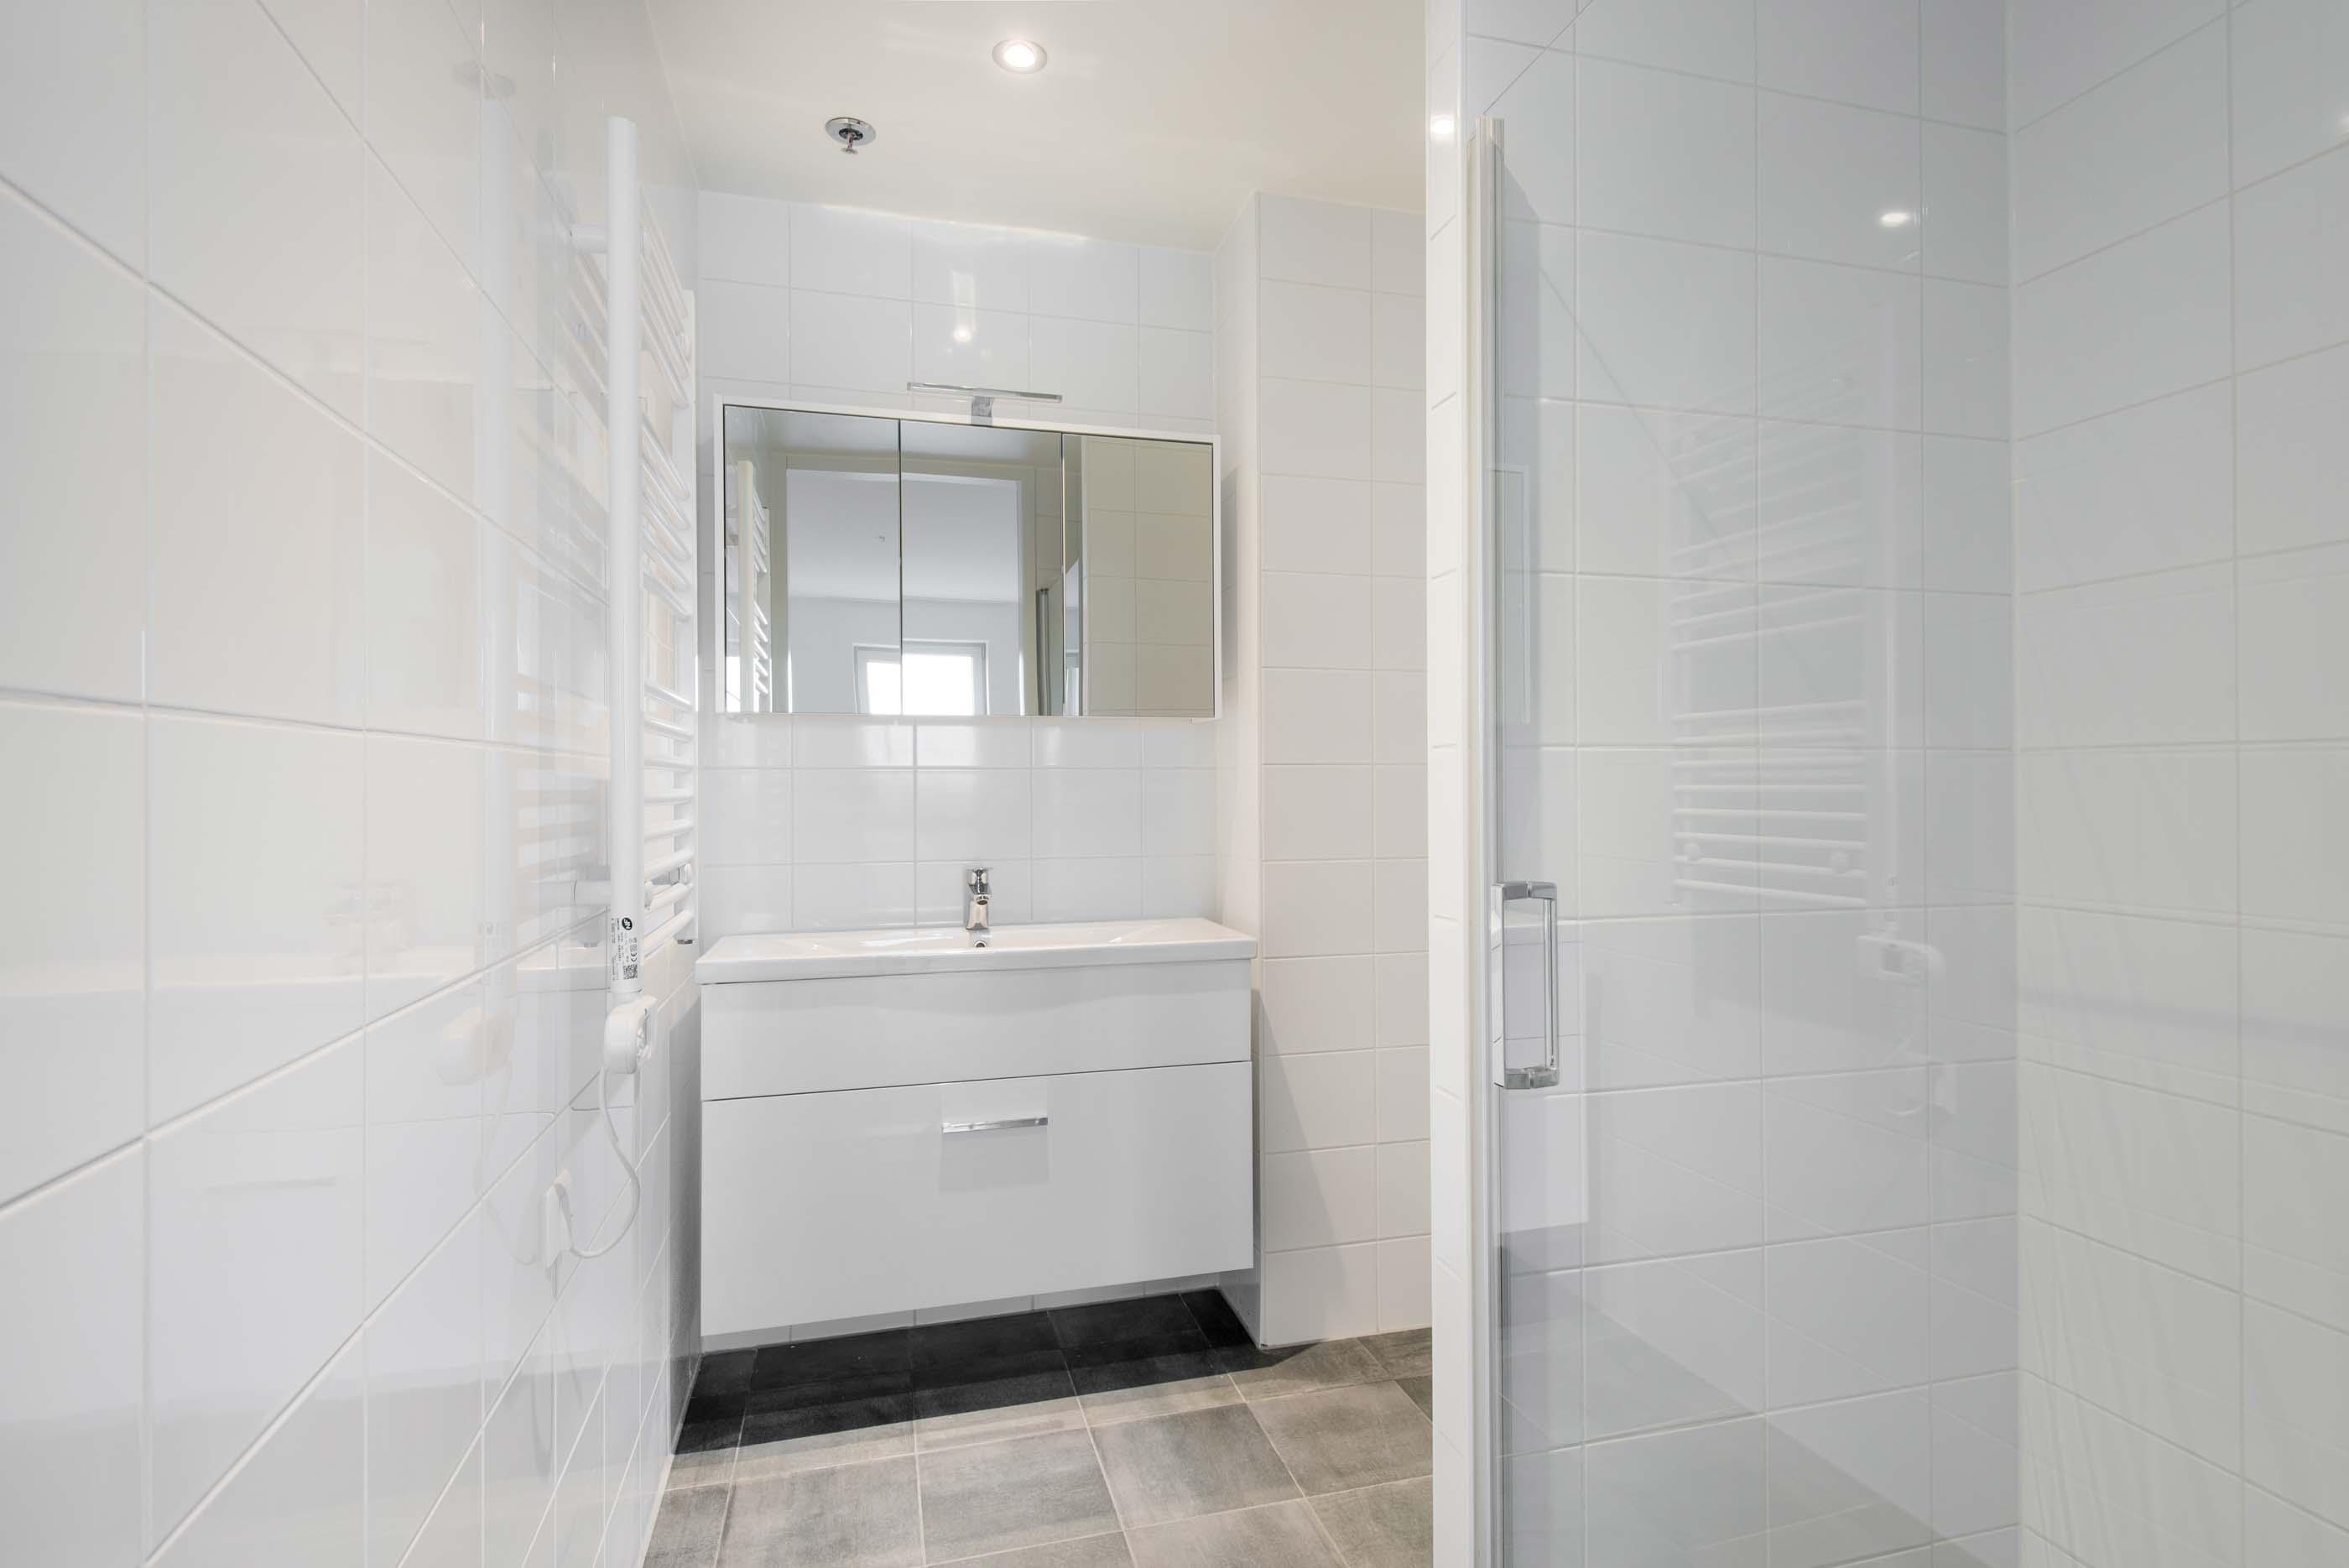 1-bedroom unfurnished apartment in OurDomain Amsterdam Diemen - interior design of bathroom